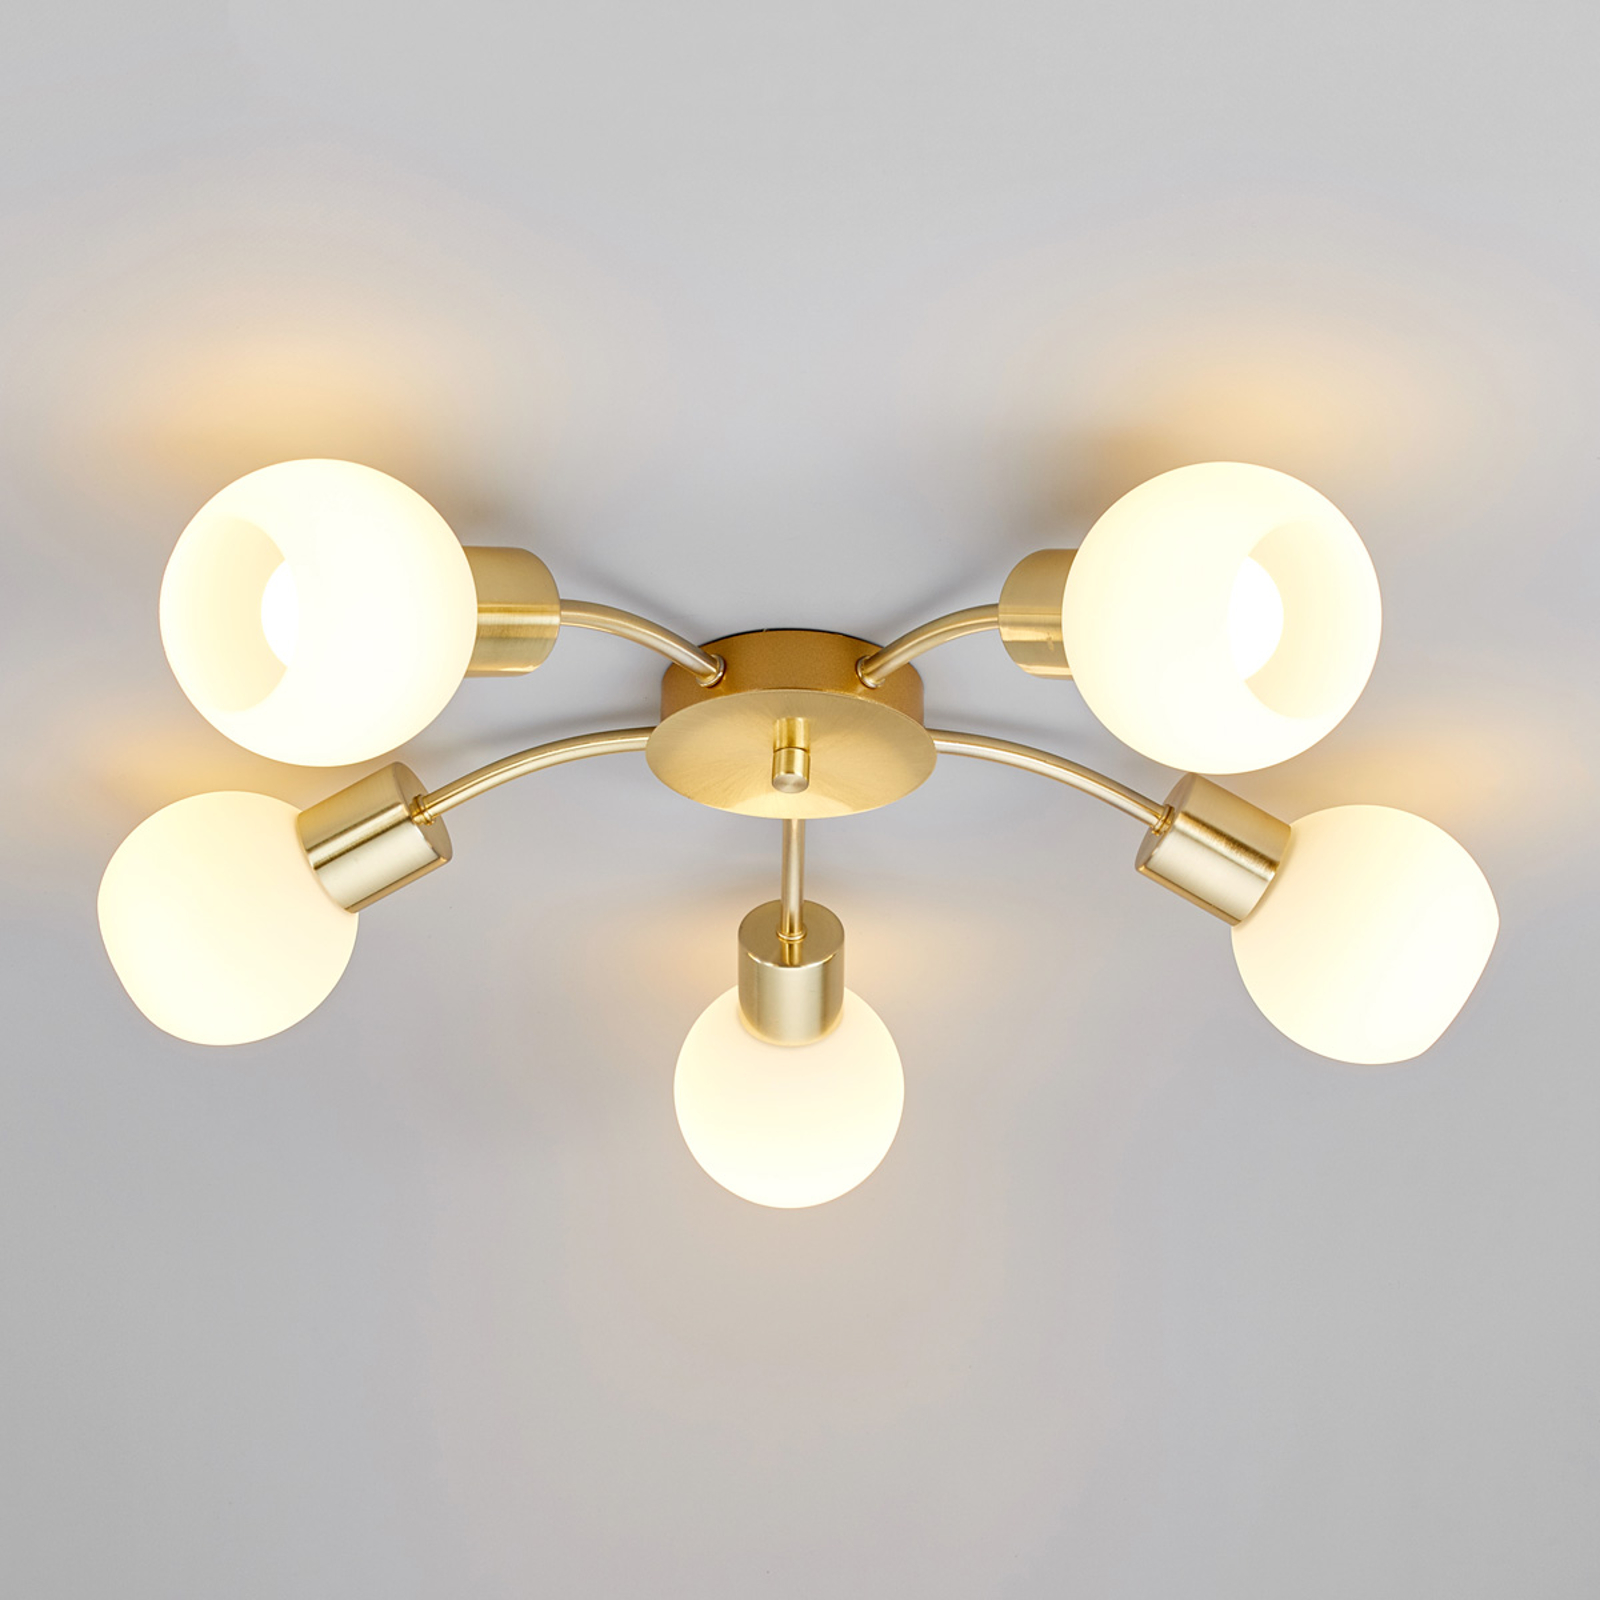 LED-Deckenleuchte Elaina 5-flg. rund, messing